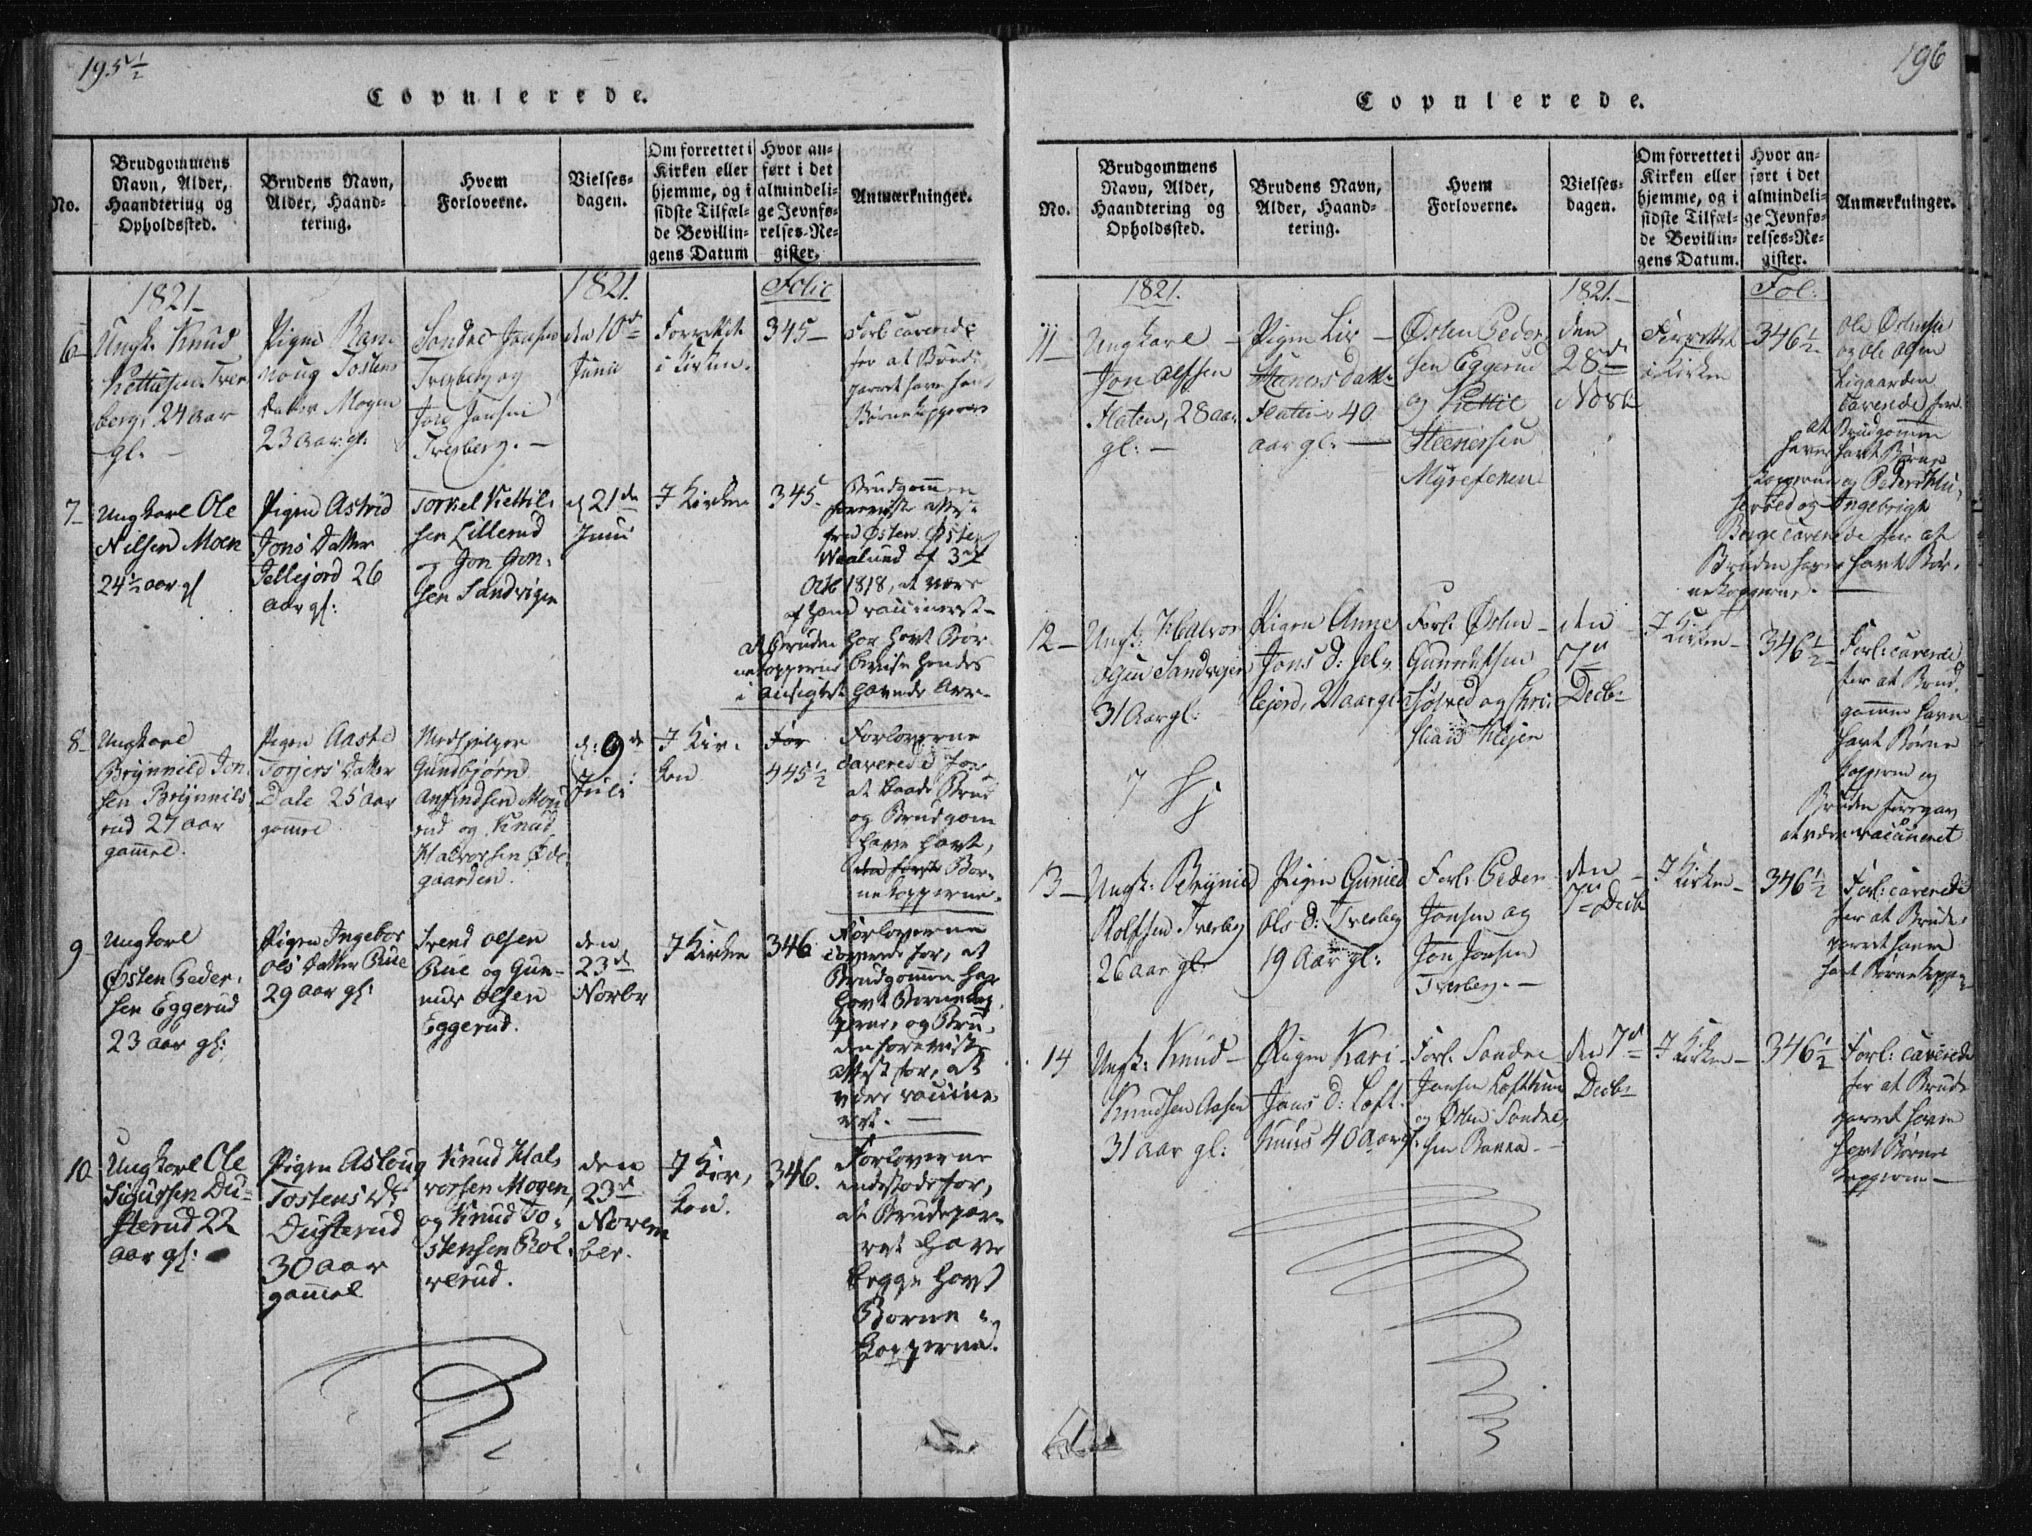 SAKO, Tinn kirkebøker, F/Fa/L0004: Ministerialbok nr. I 4, 1815-1843, s. 196